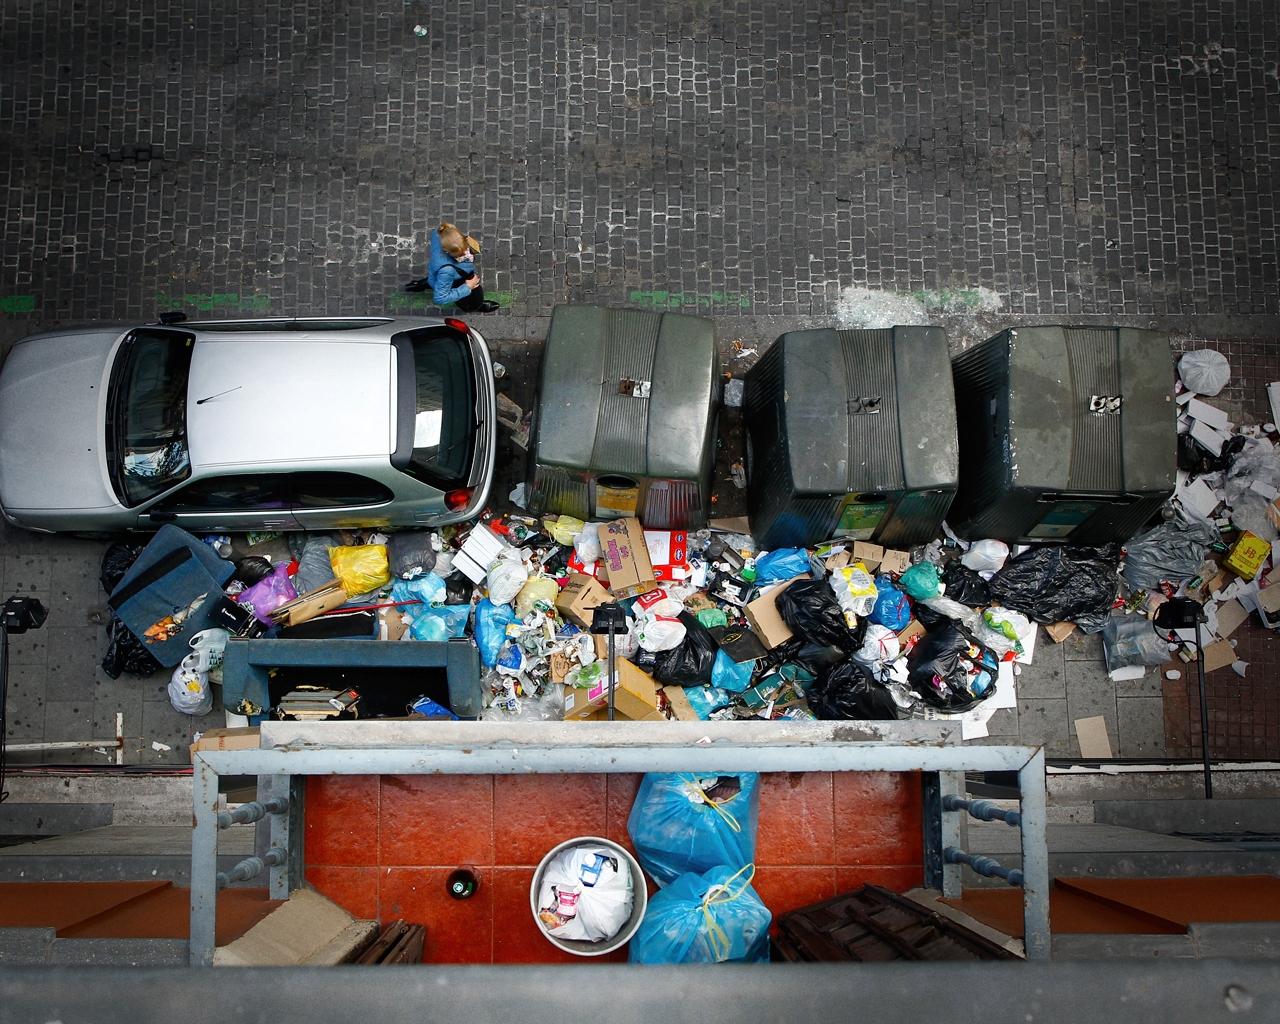 Huelga de basuras